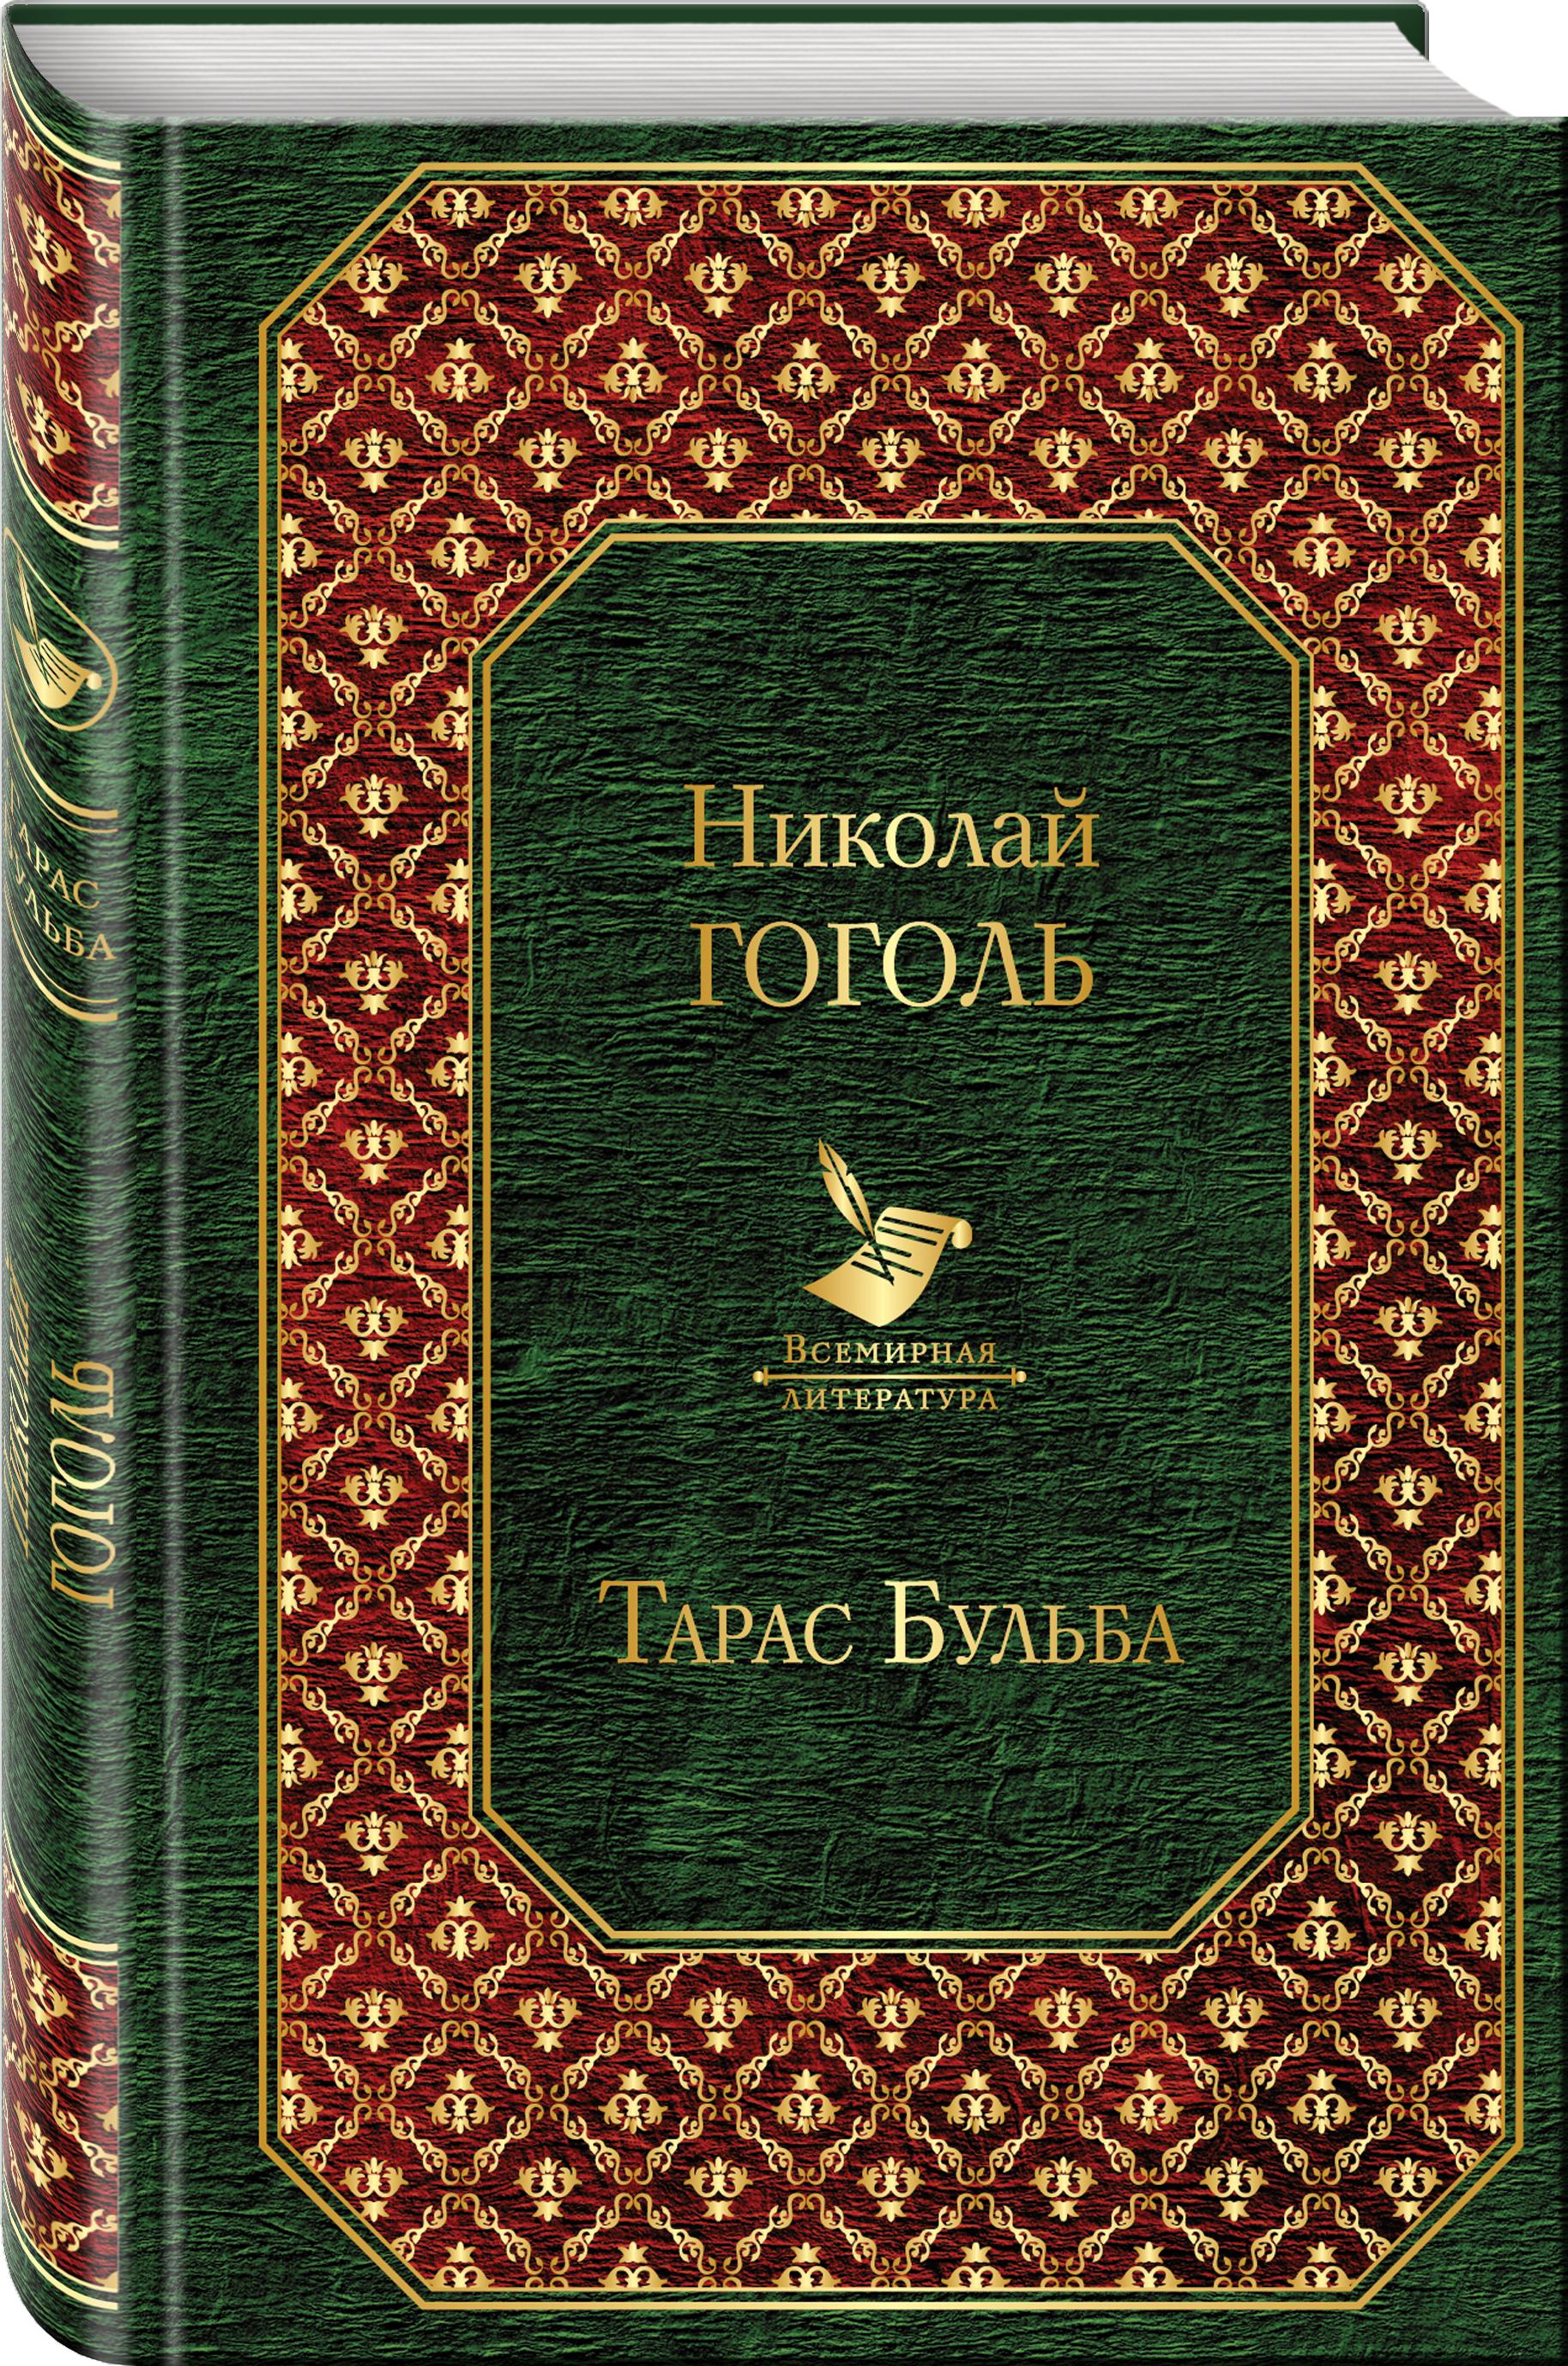 Гоголь Николай Васильевич Тарас Бульба